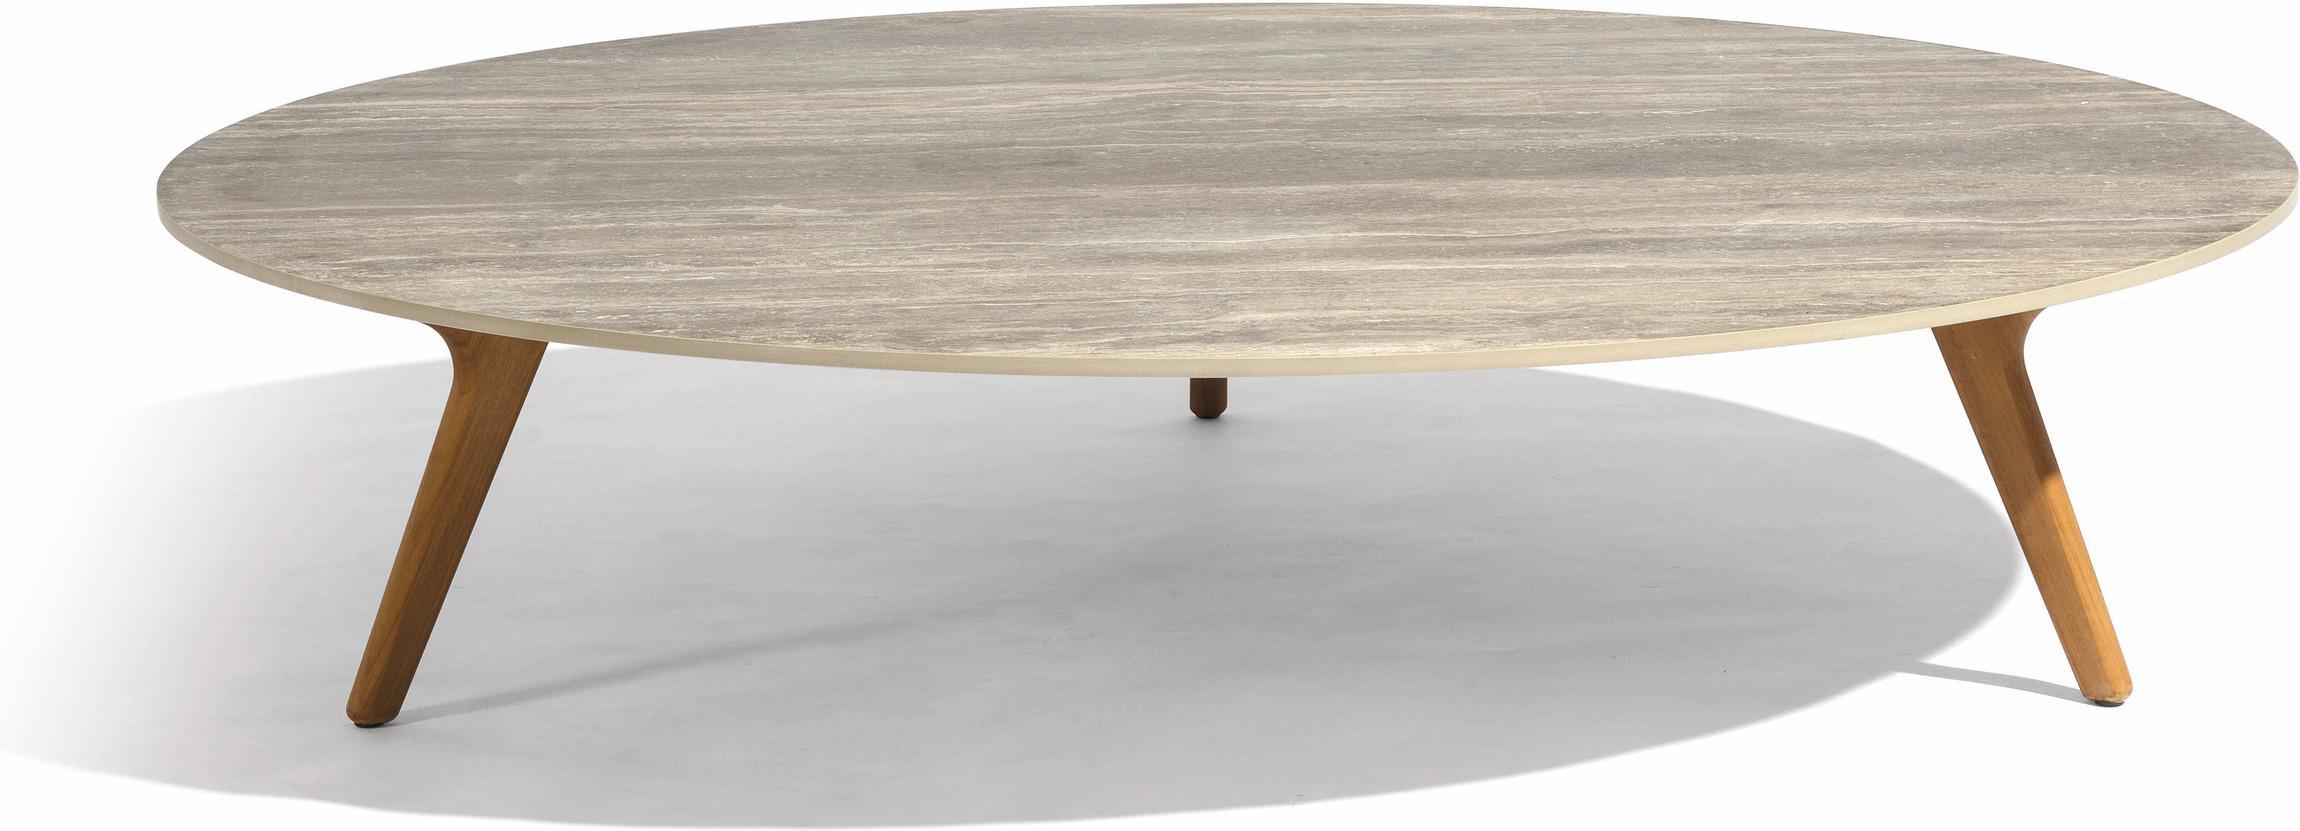 Torsa Low table - Teak - CT 148